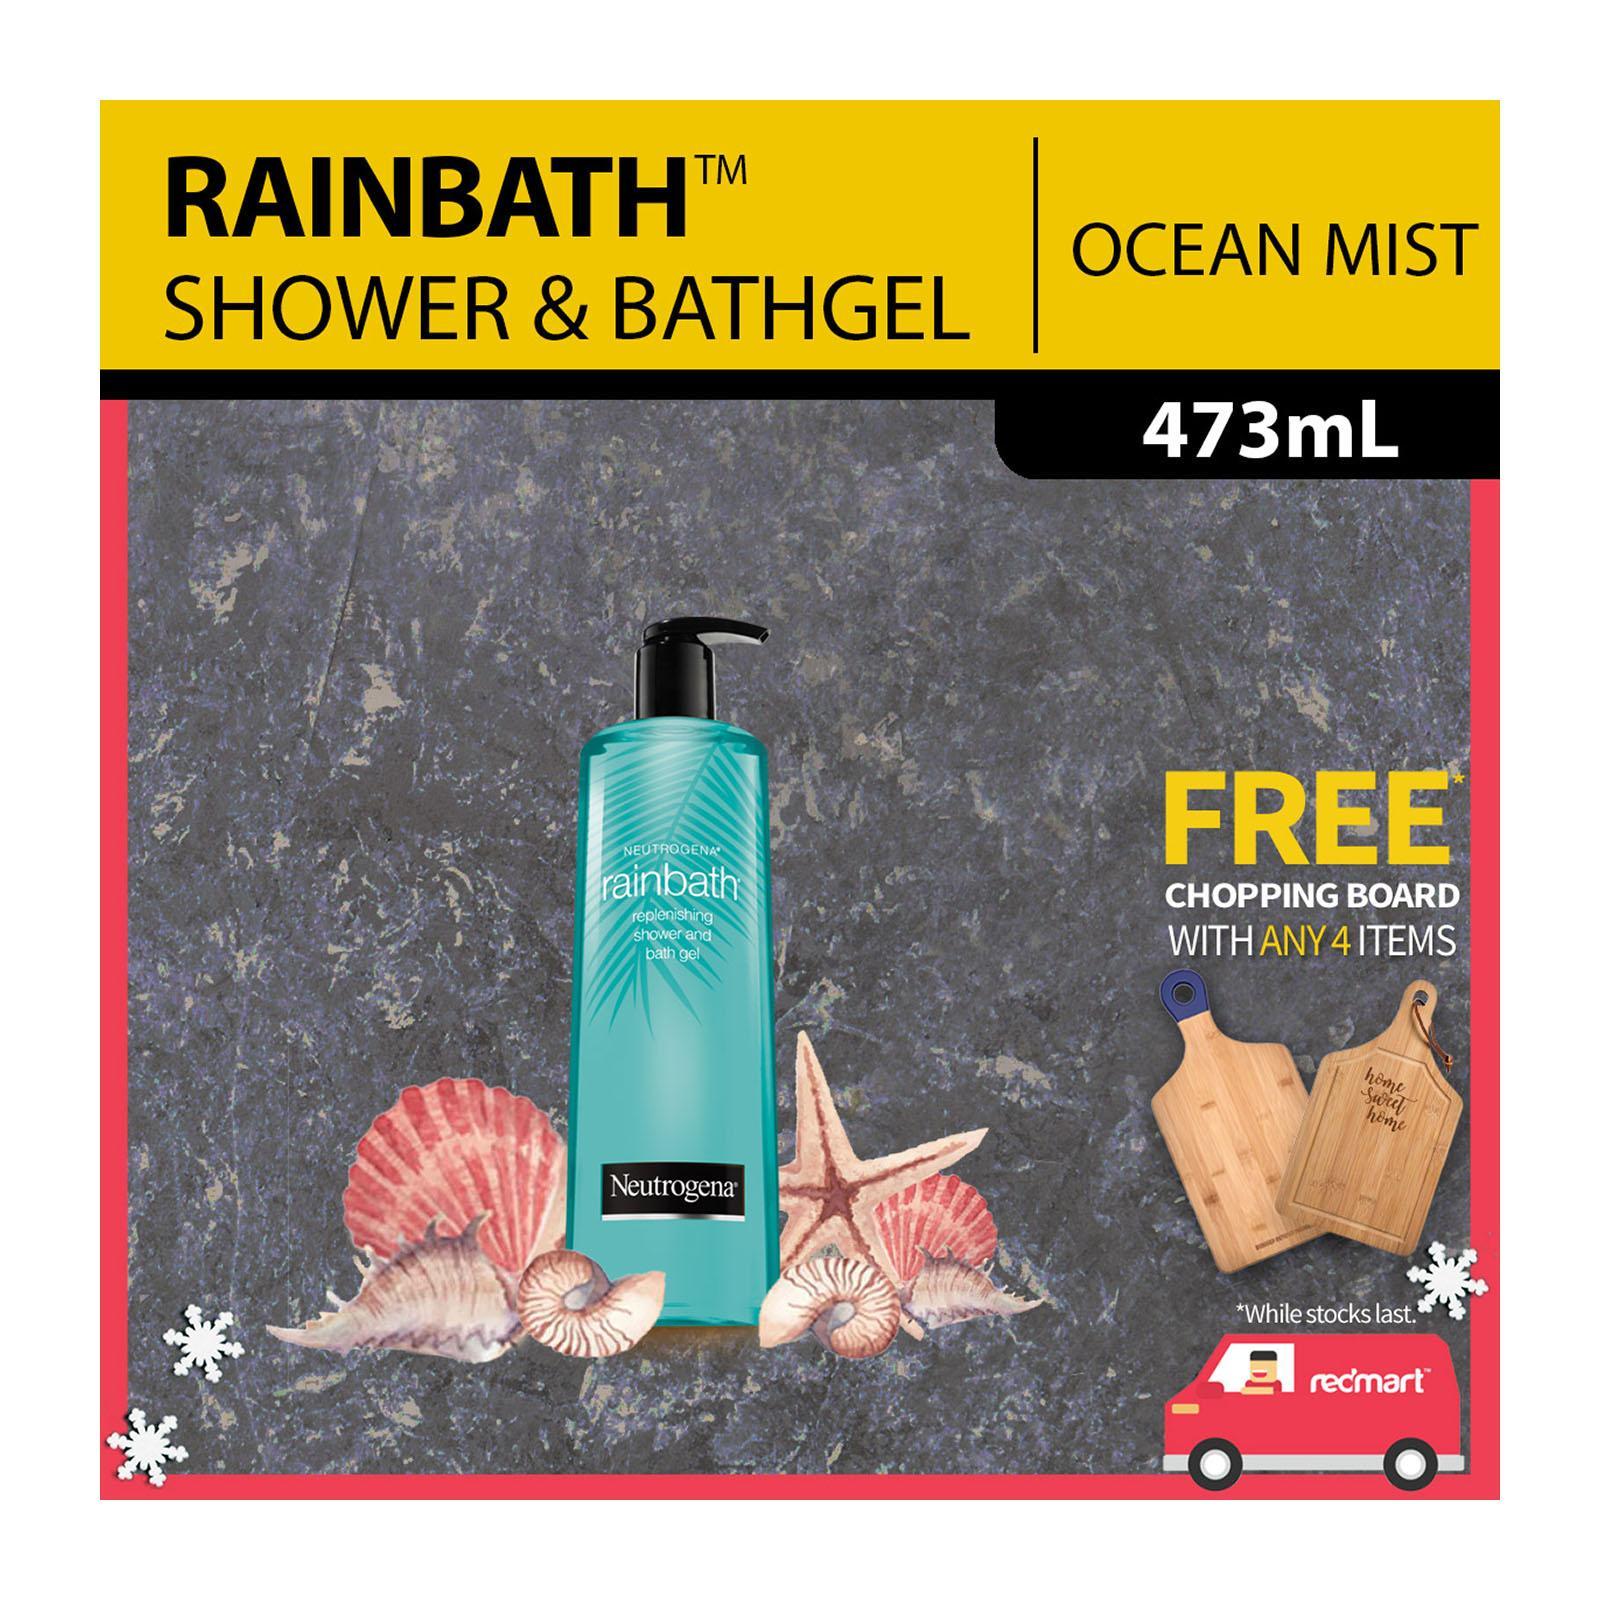 Neutrogena Rainbath Replenishing Ocean Mist Shower and Bath Gel, 473ml